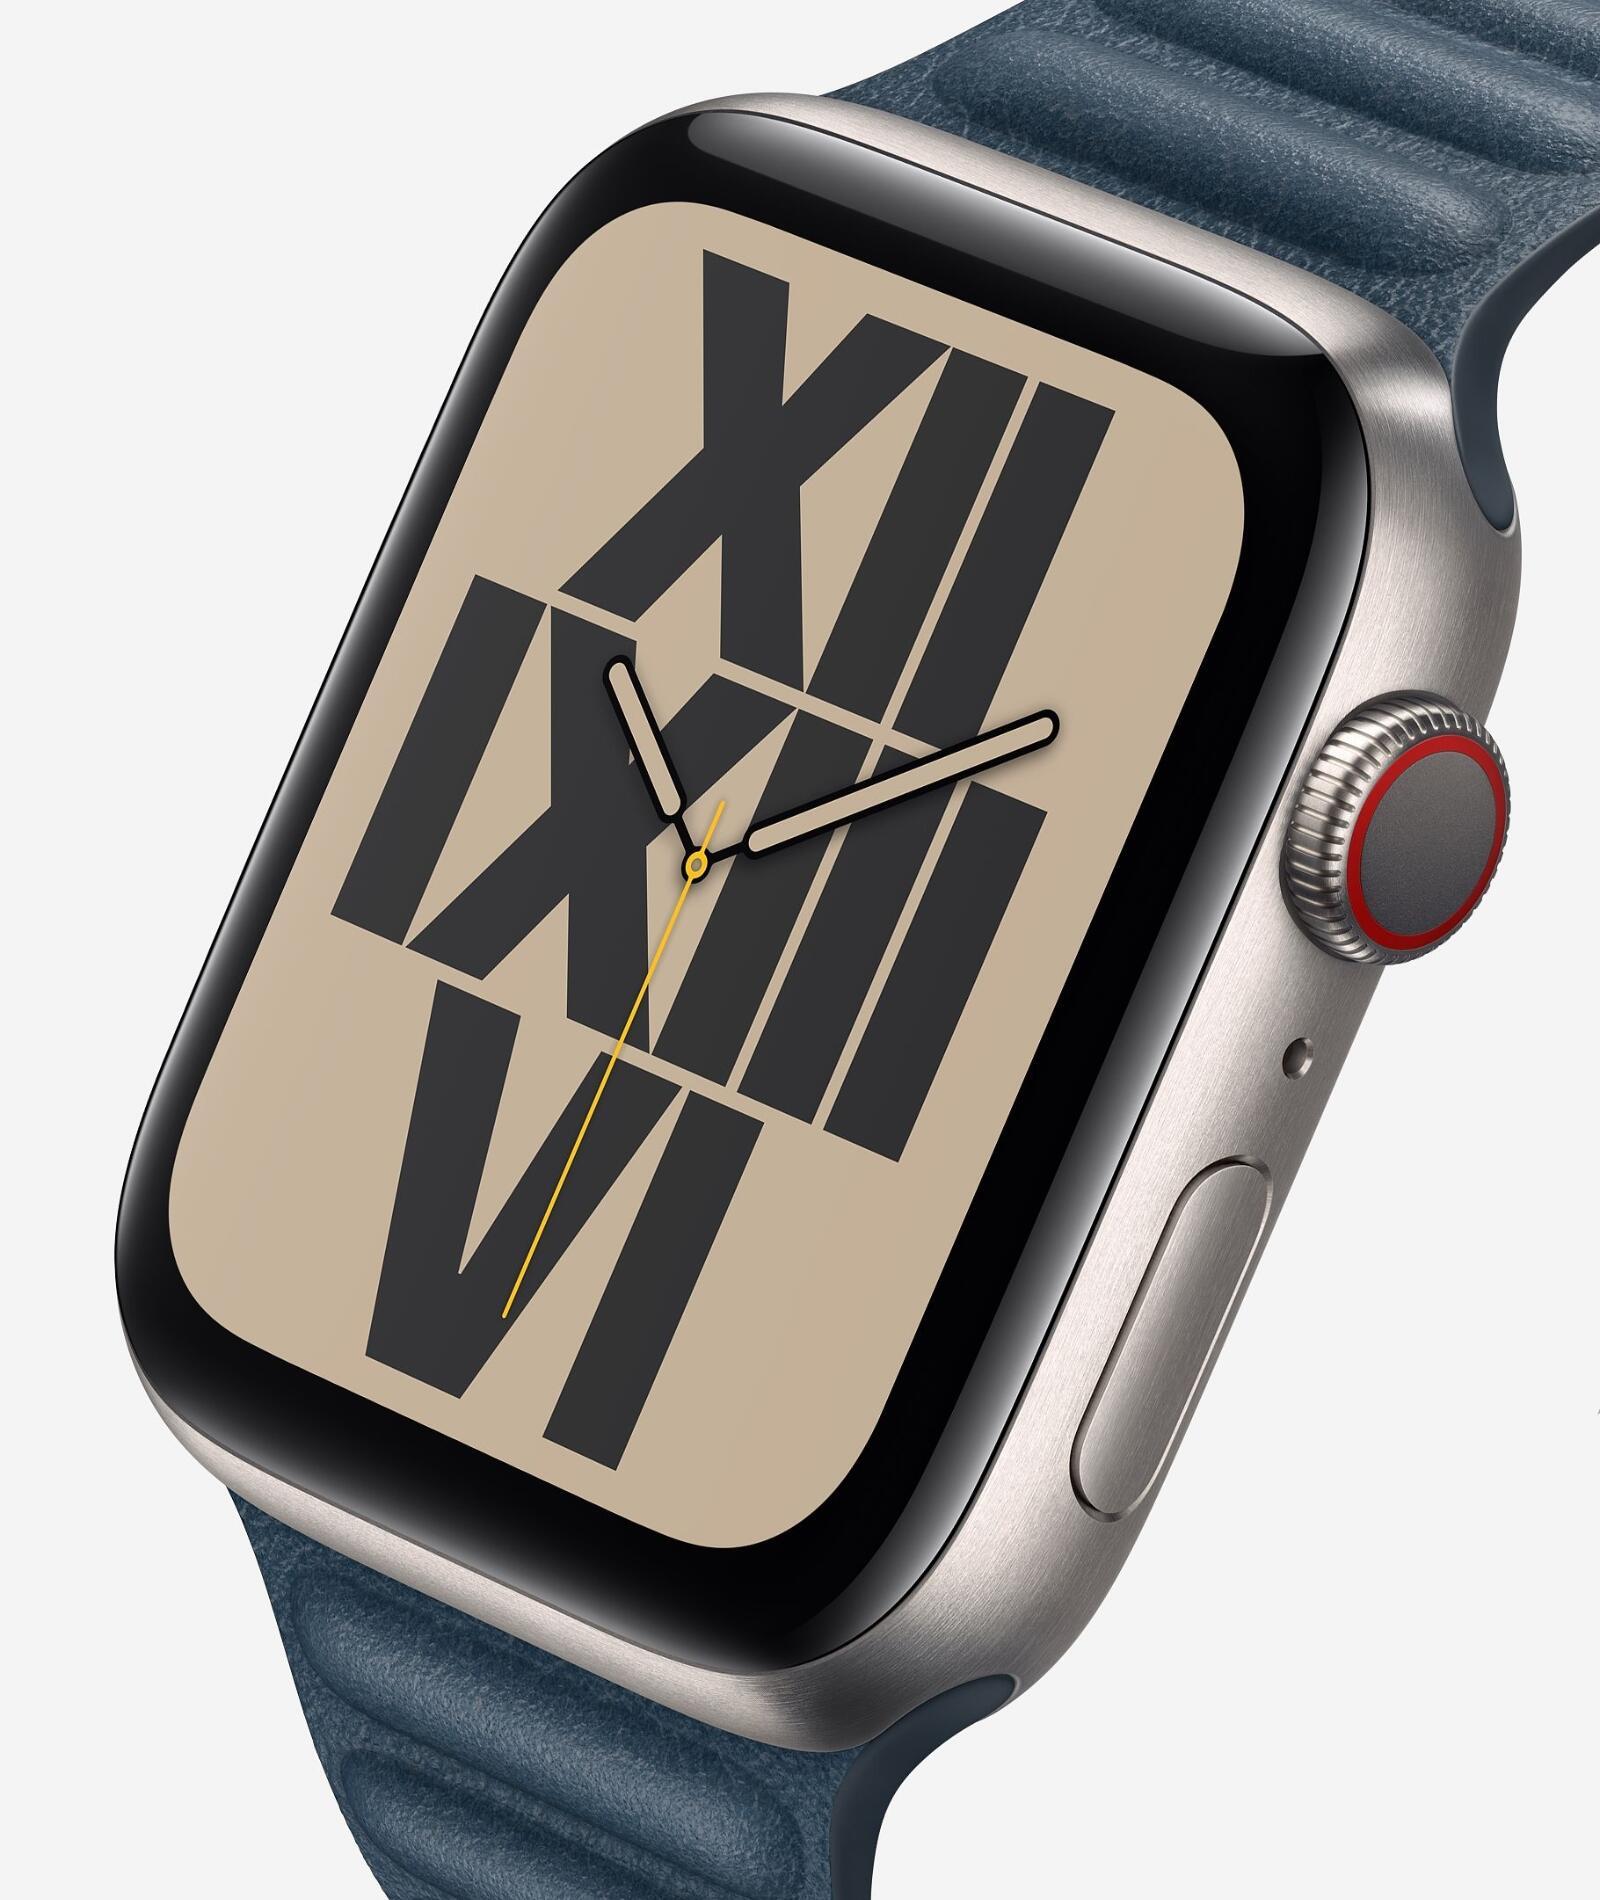 Apple Watch Series 6 Edition Titan